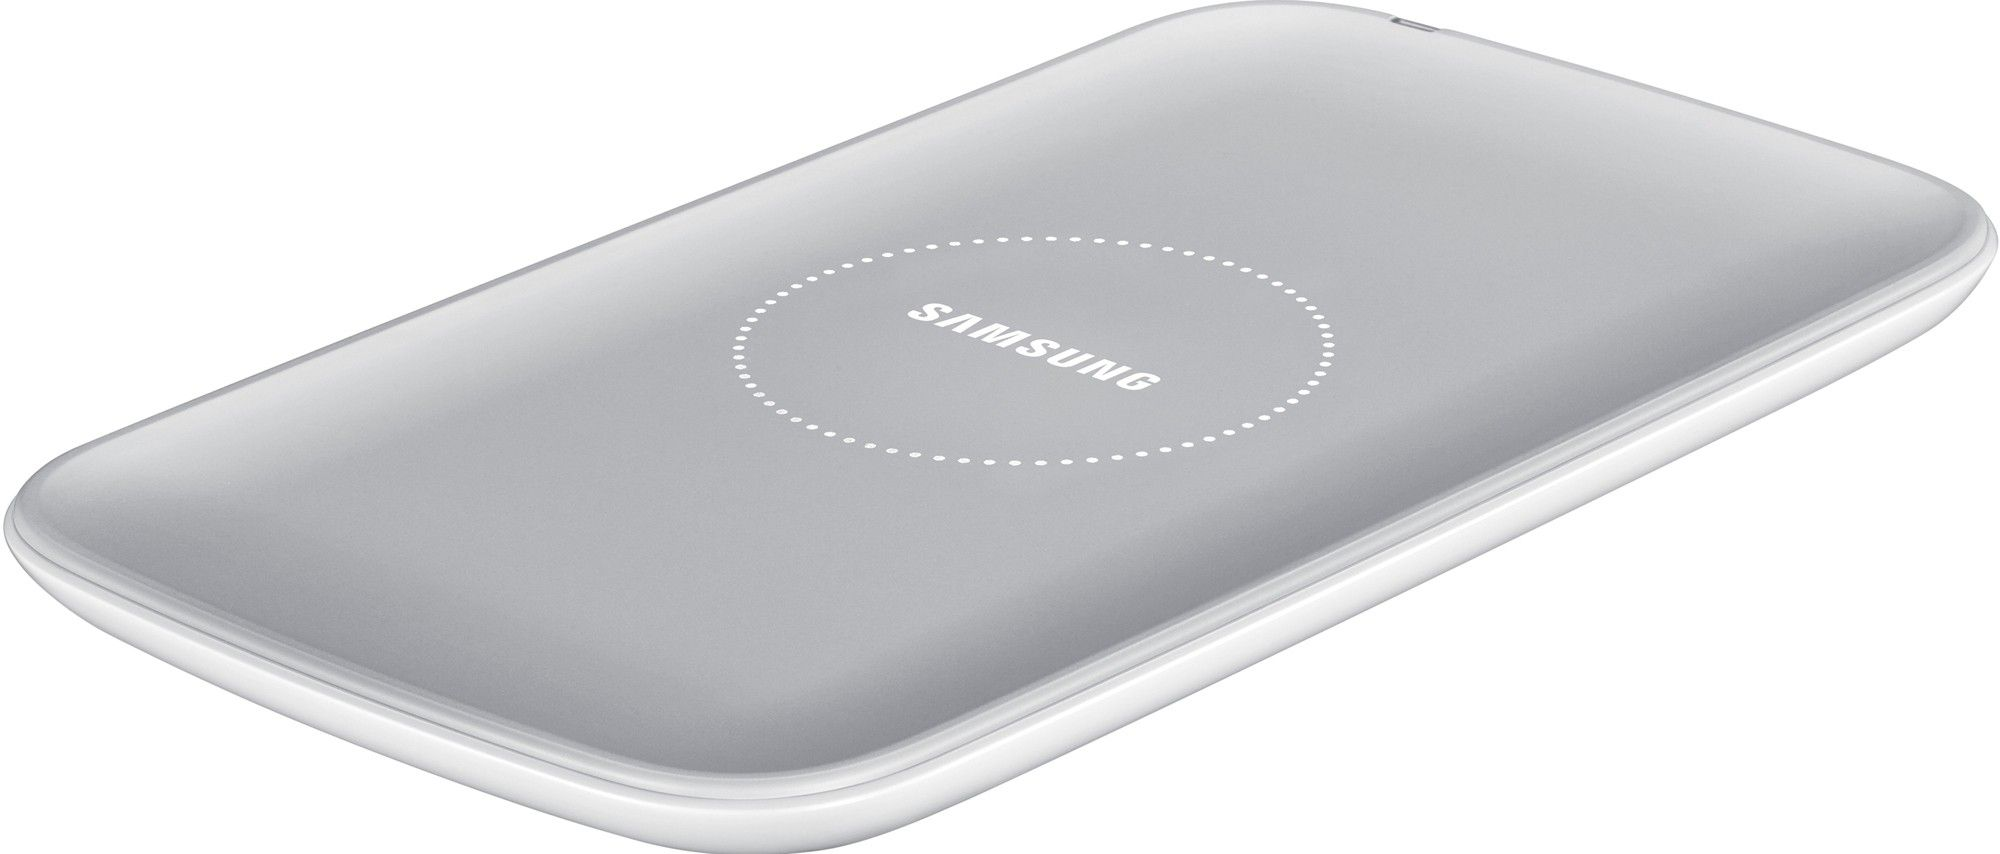 Беспроводное зарядное устройство Samsung Galaxy S4 I9500 (EP-WI950EBEGWW) Black - 1